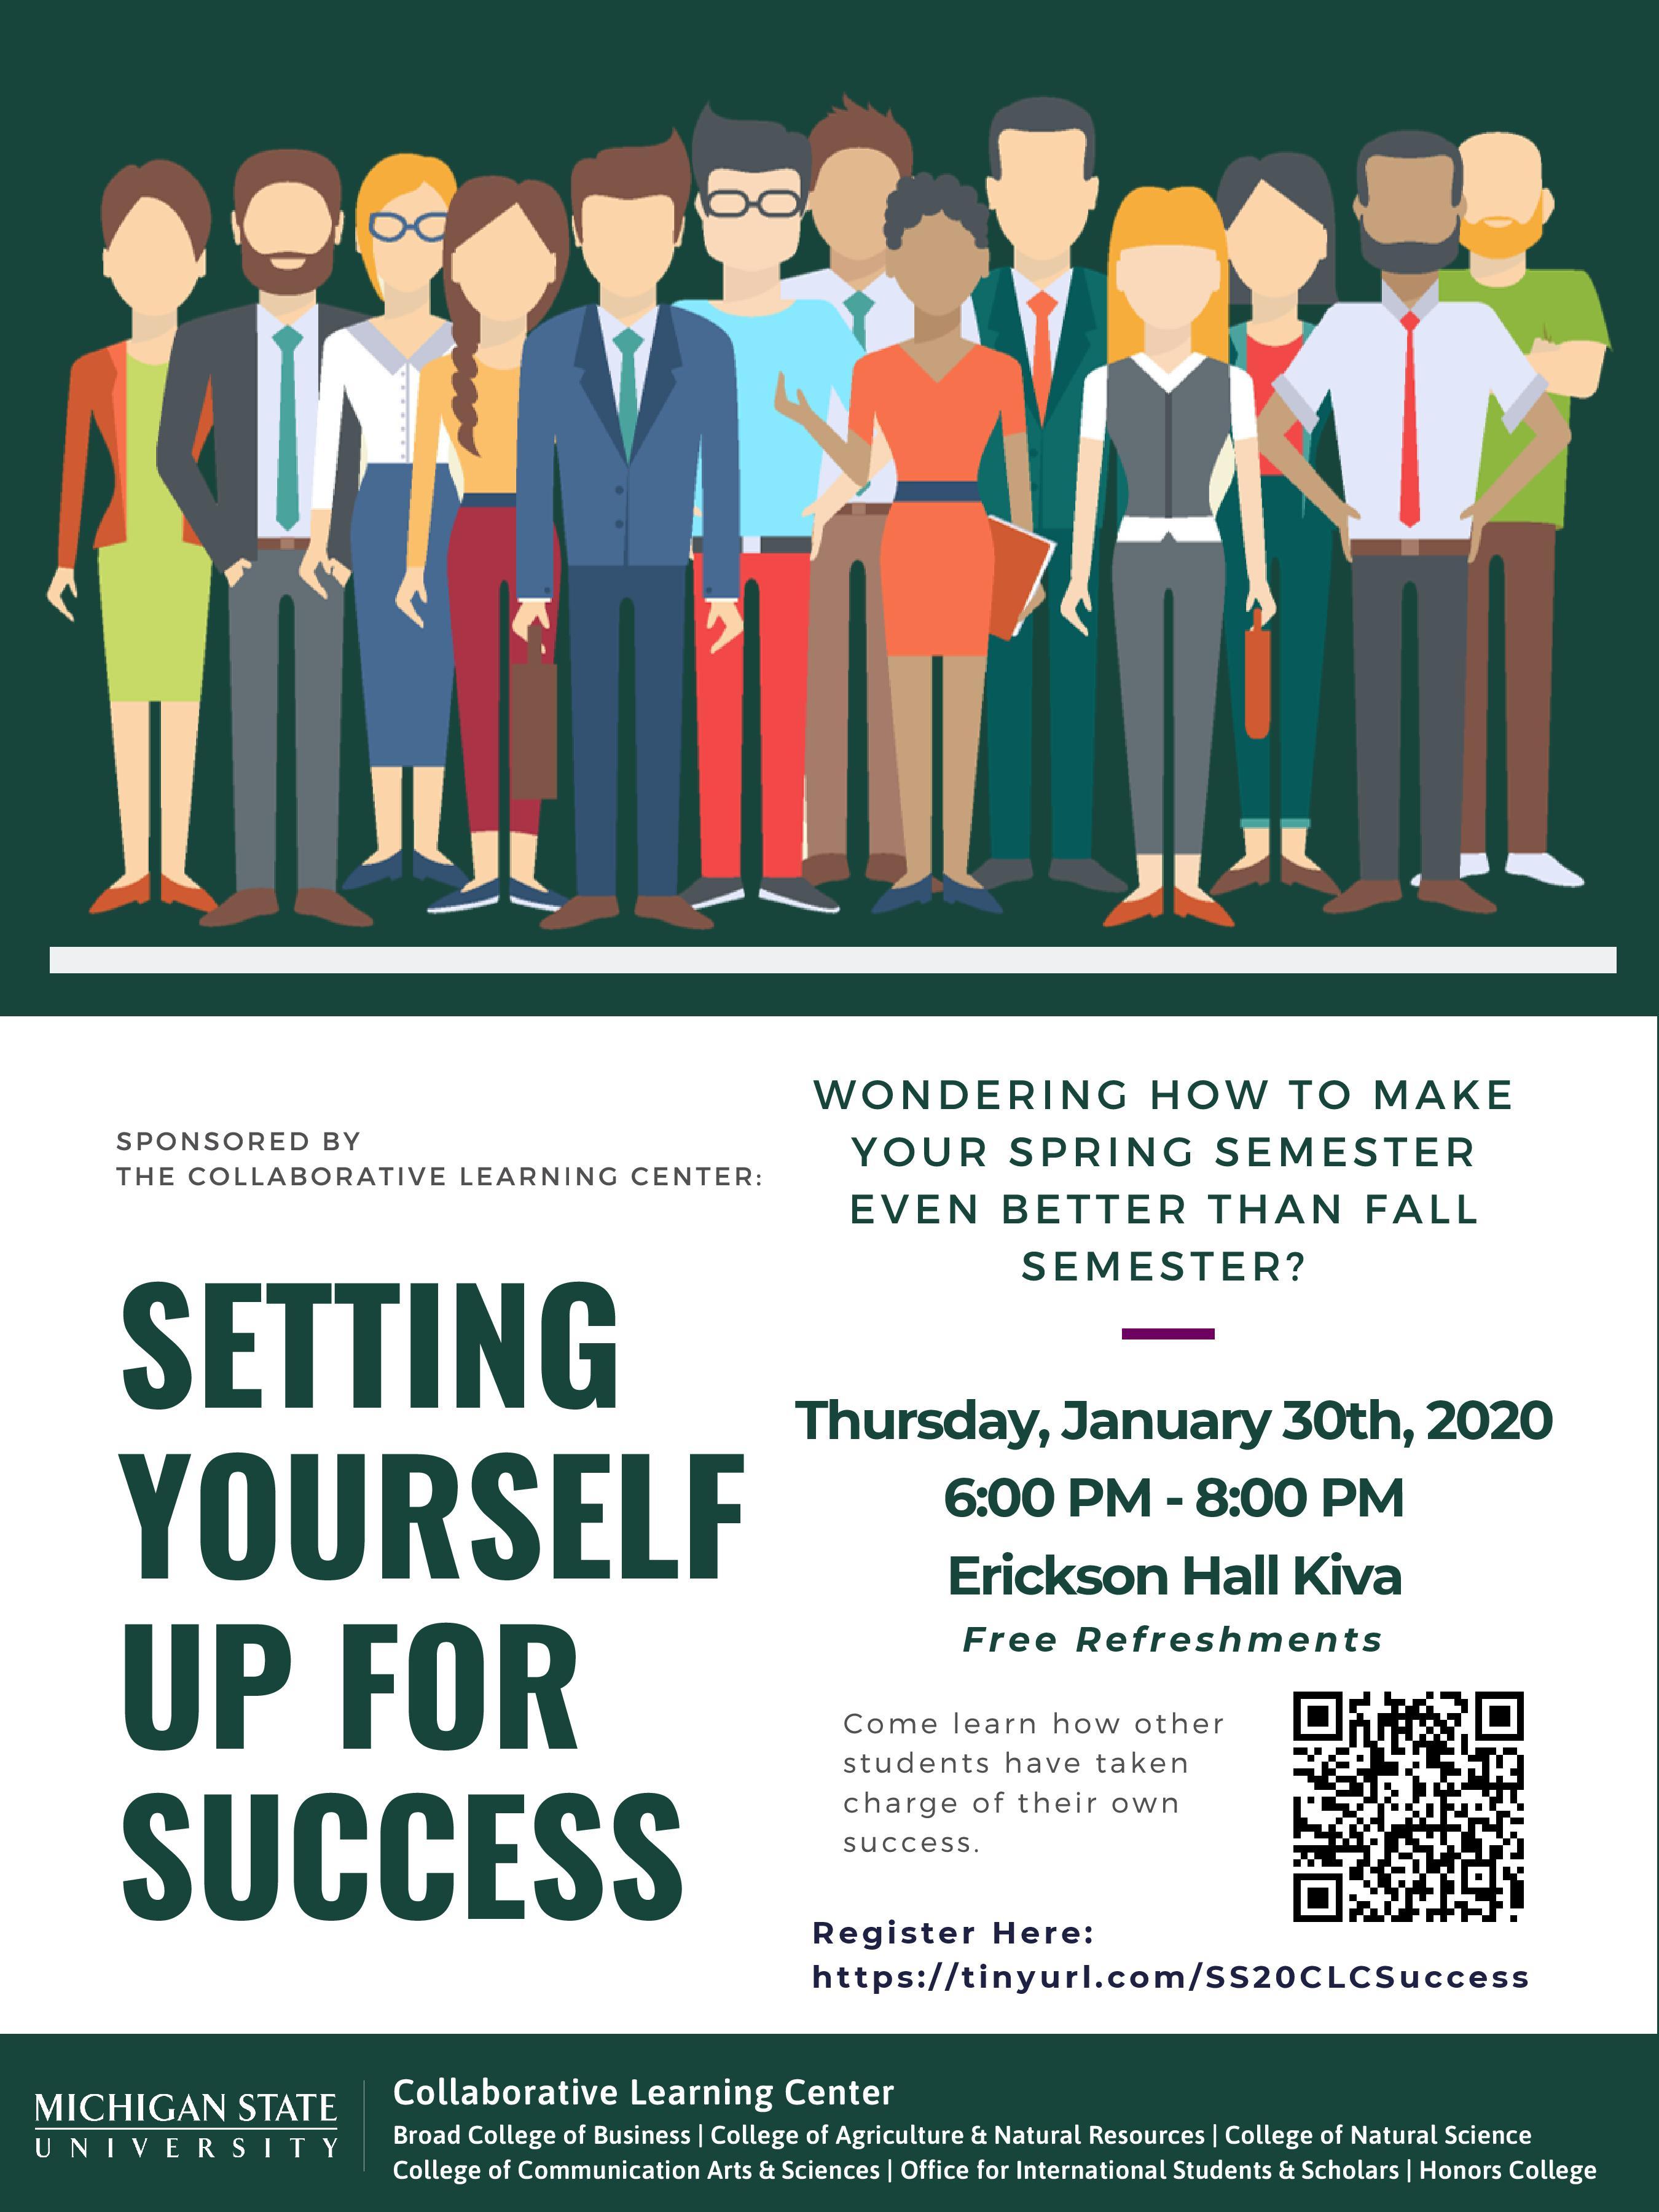 Setting Yourself Up For Success @ Erickson Hall Kiva